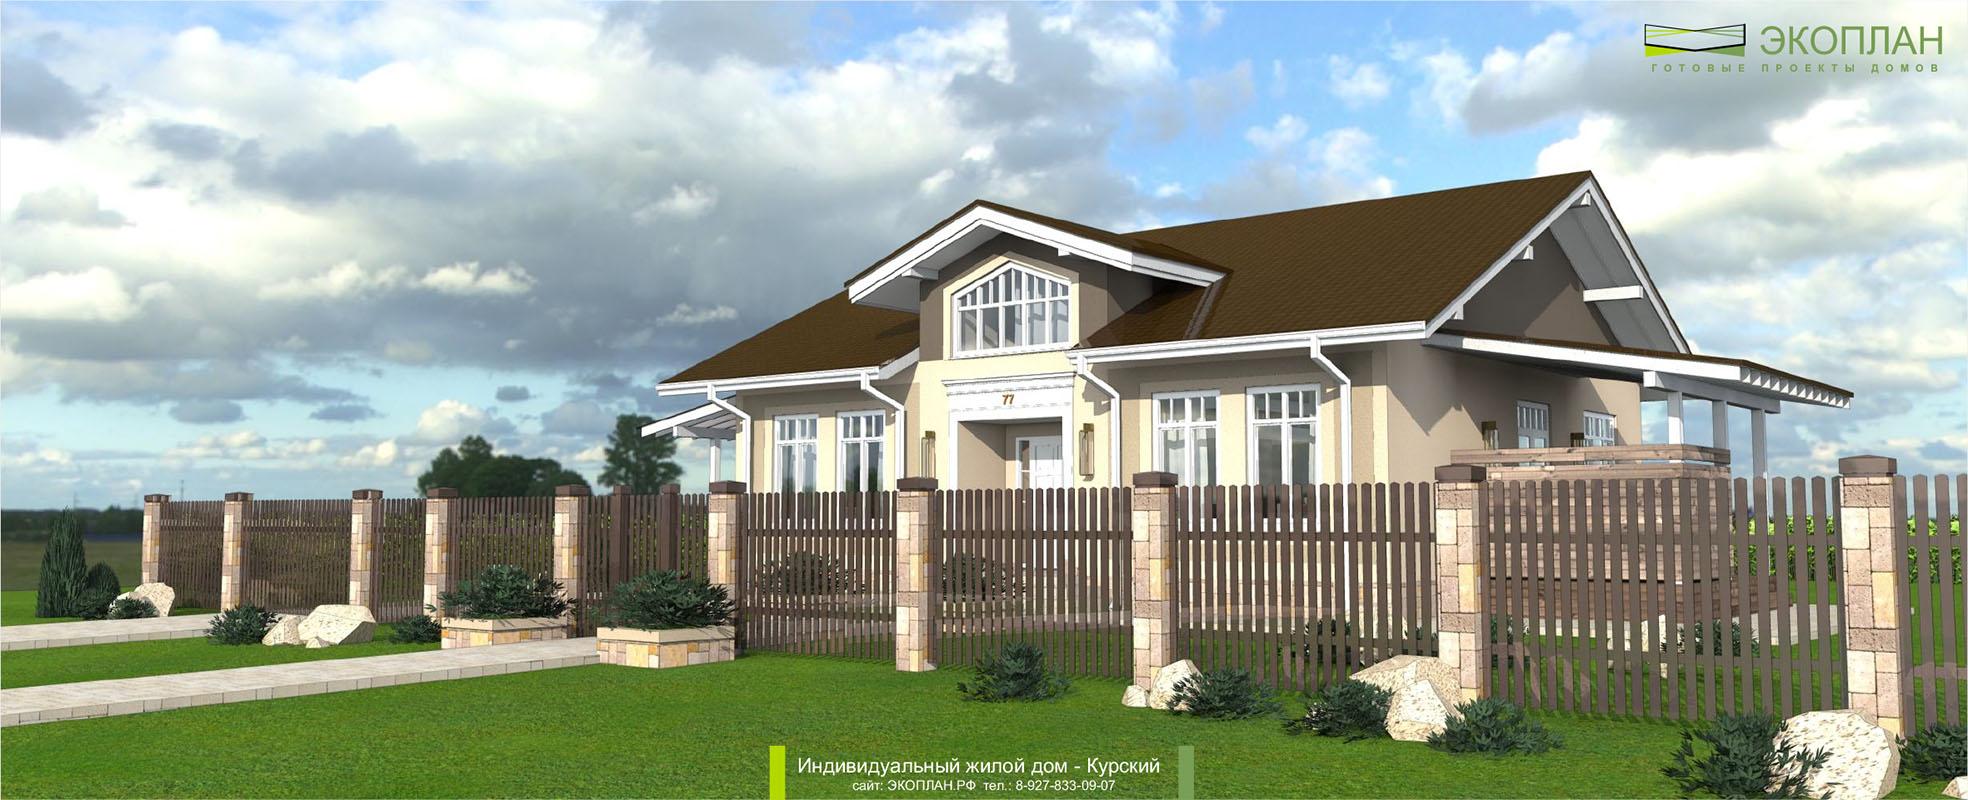 Готовый проект дома - Курский - Экоплан фасад